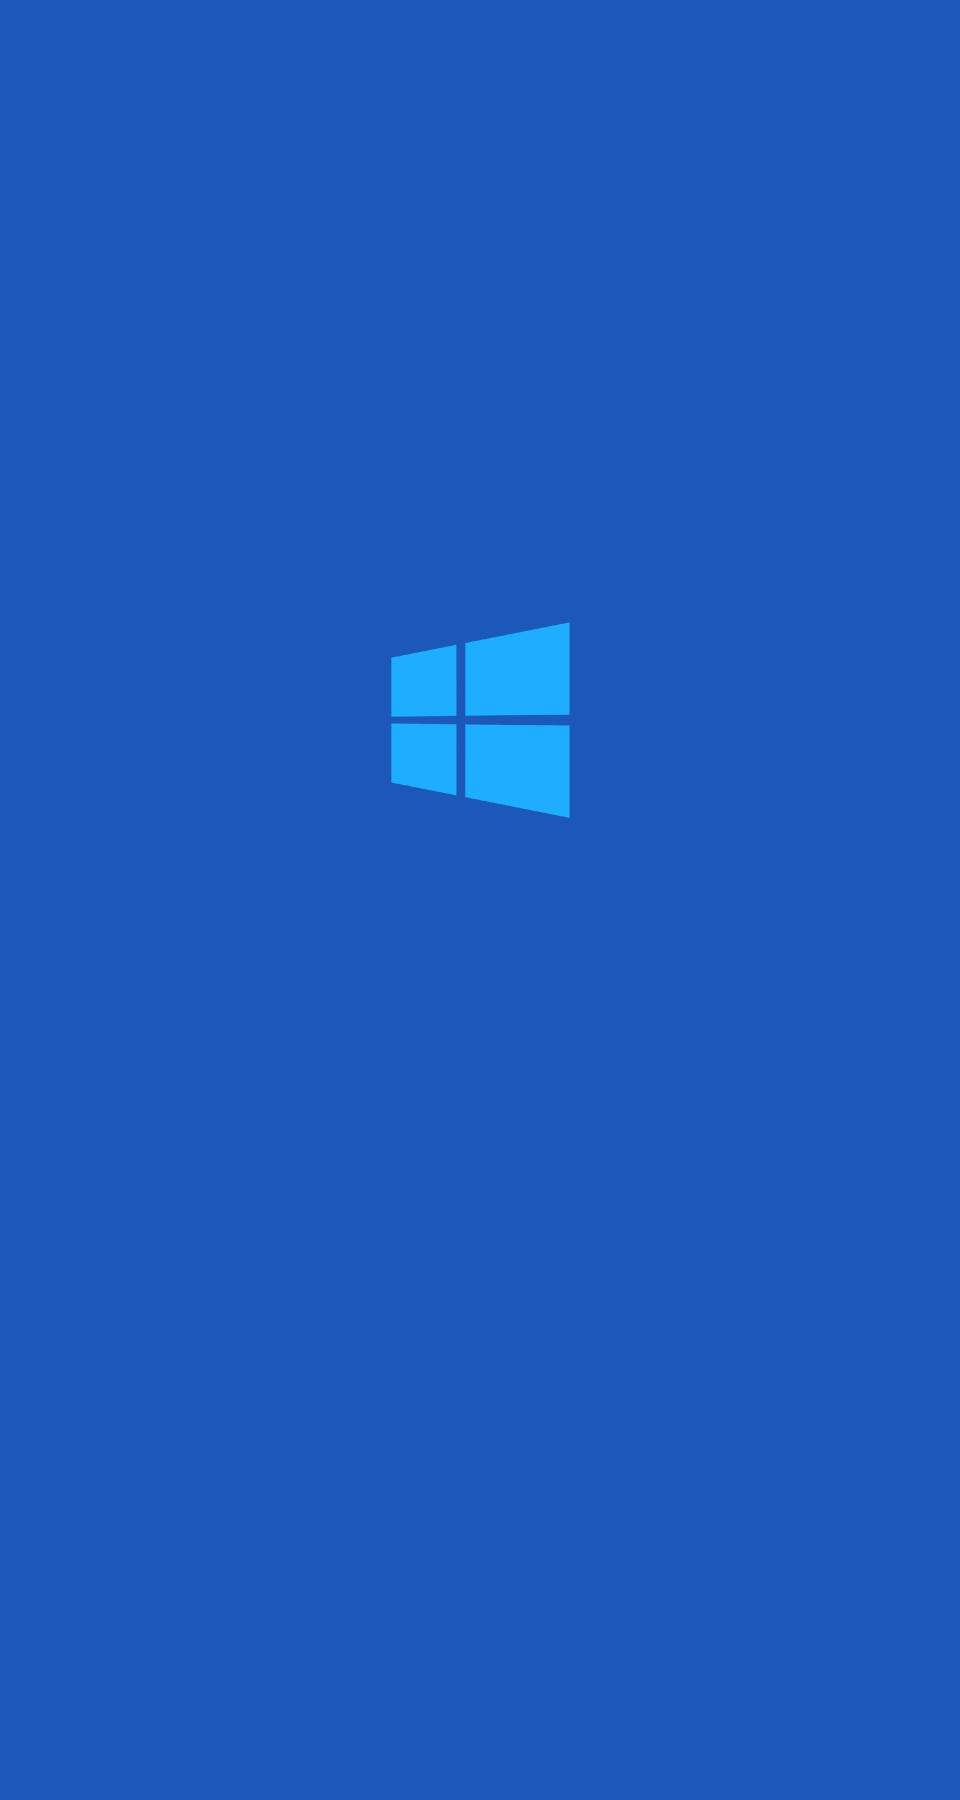 Windows Phone Wallpaper Hd Windows phone 960x1800